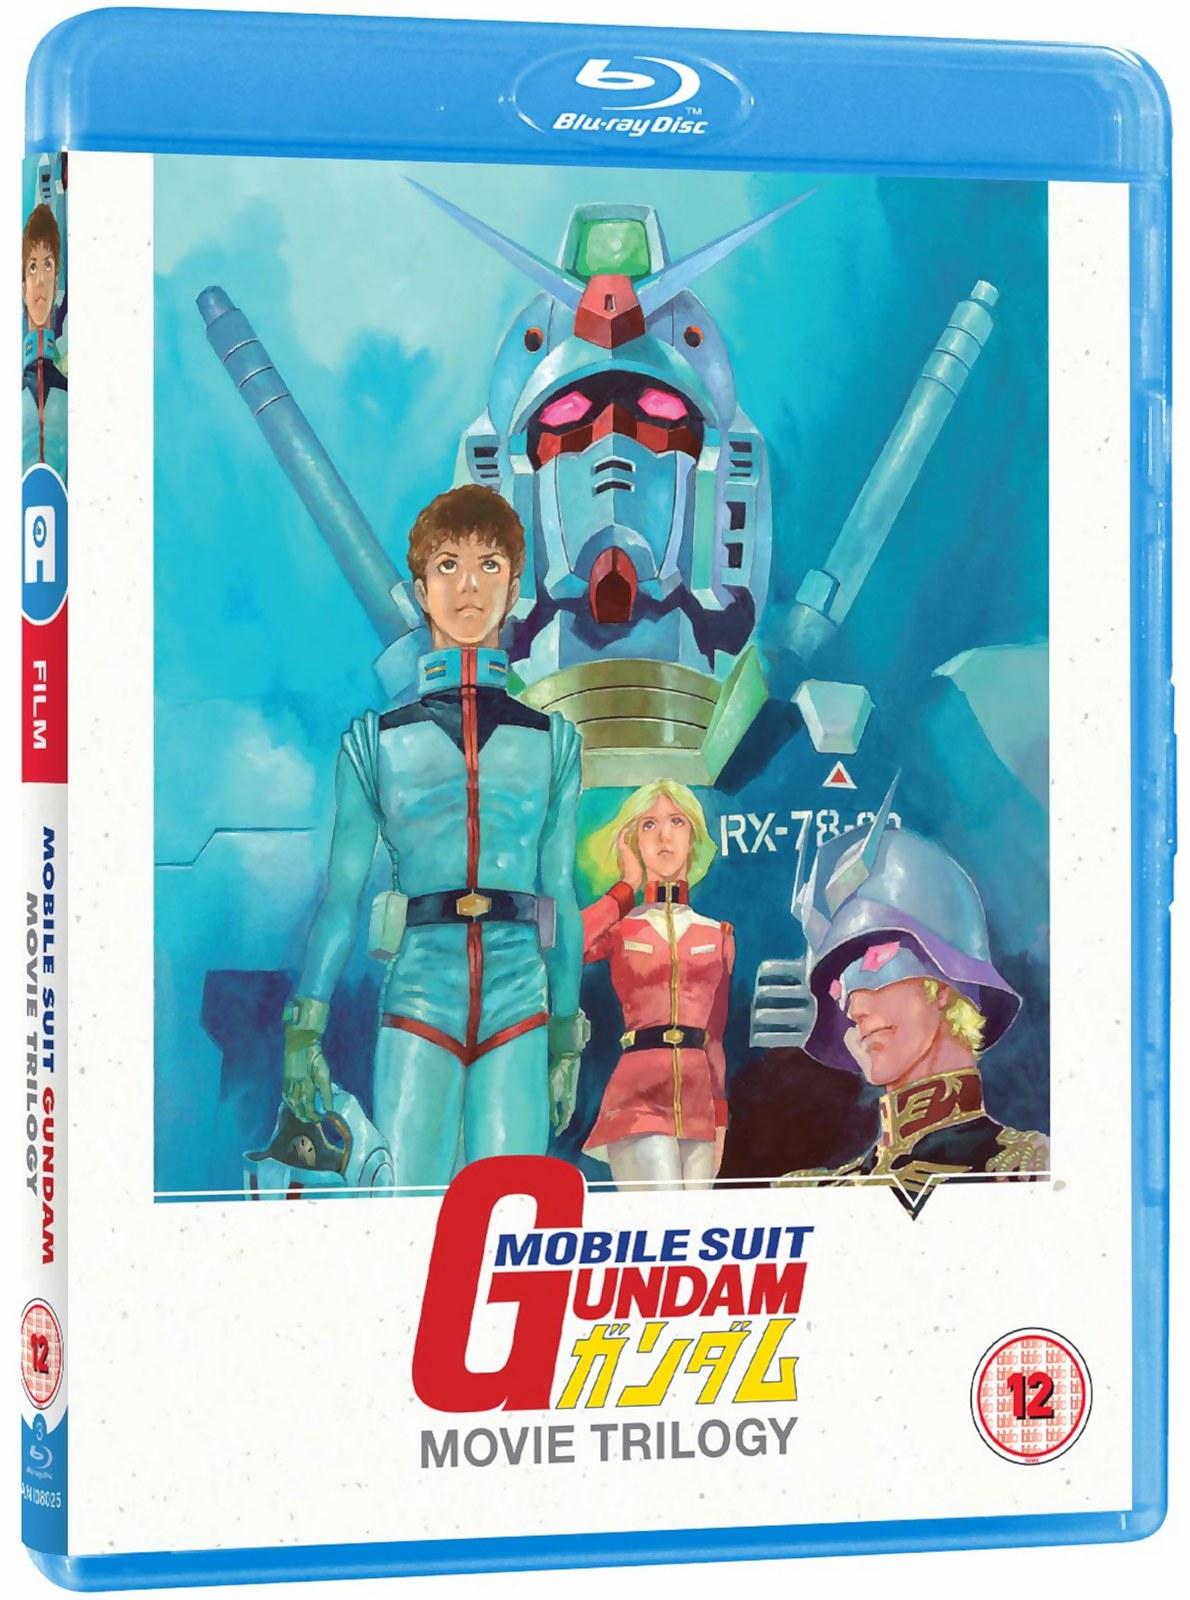 Mobile Suit Gundam Movie Trilogy - Standard Edition